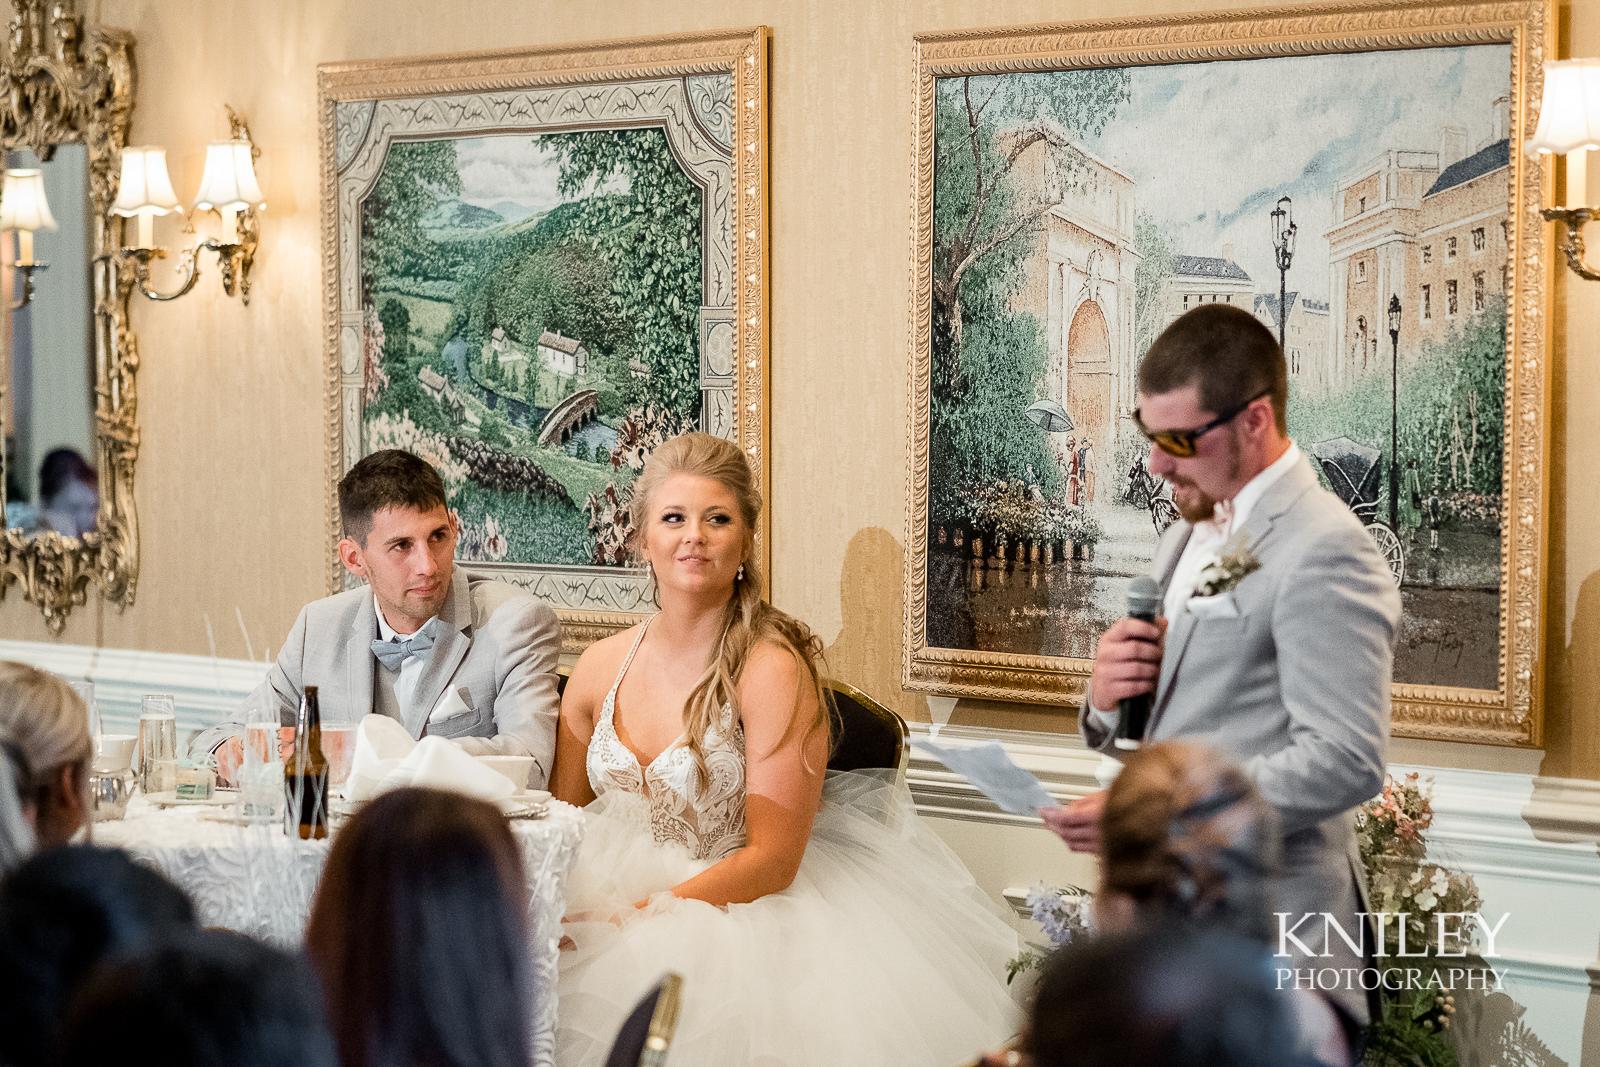 097 - Buffalo NY wedding pictures - Sean Patrick Restaurant Wedding Reception - Getzville - XT2A7341.jpg